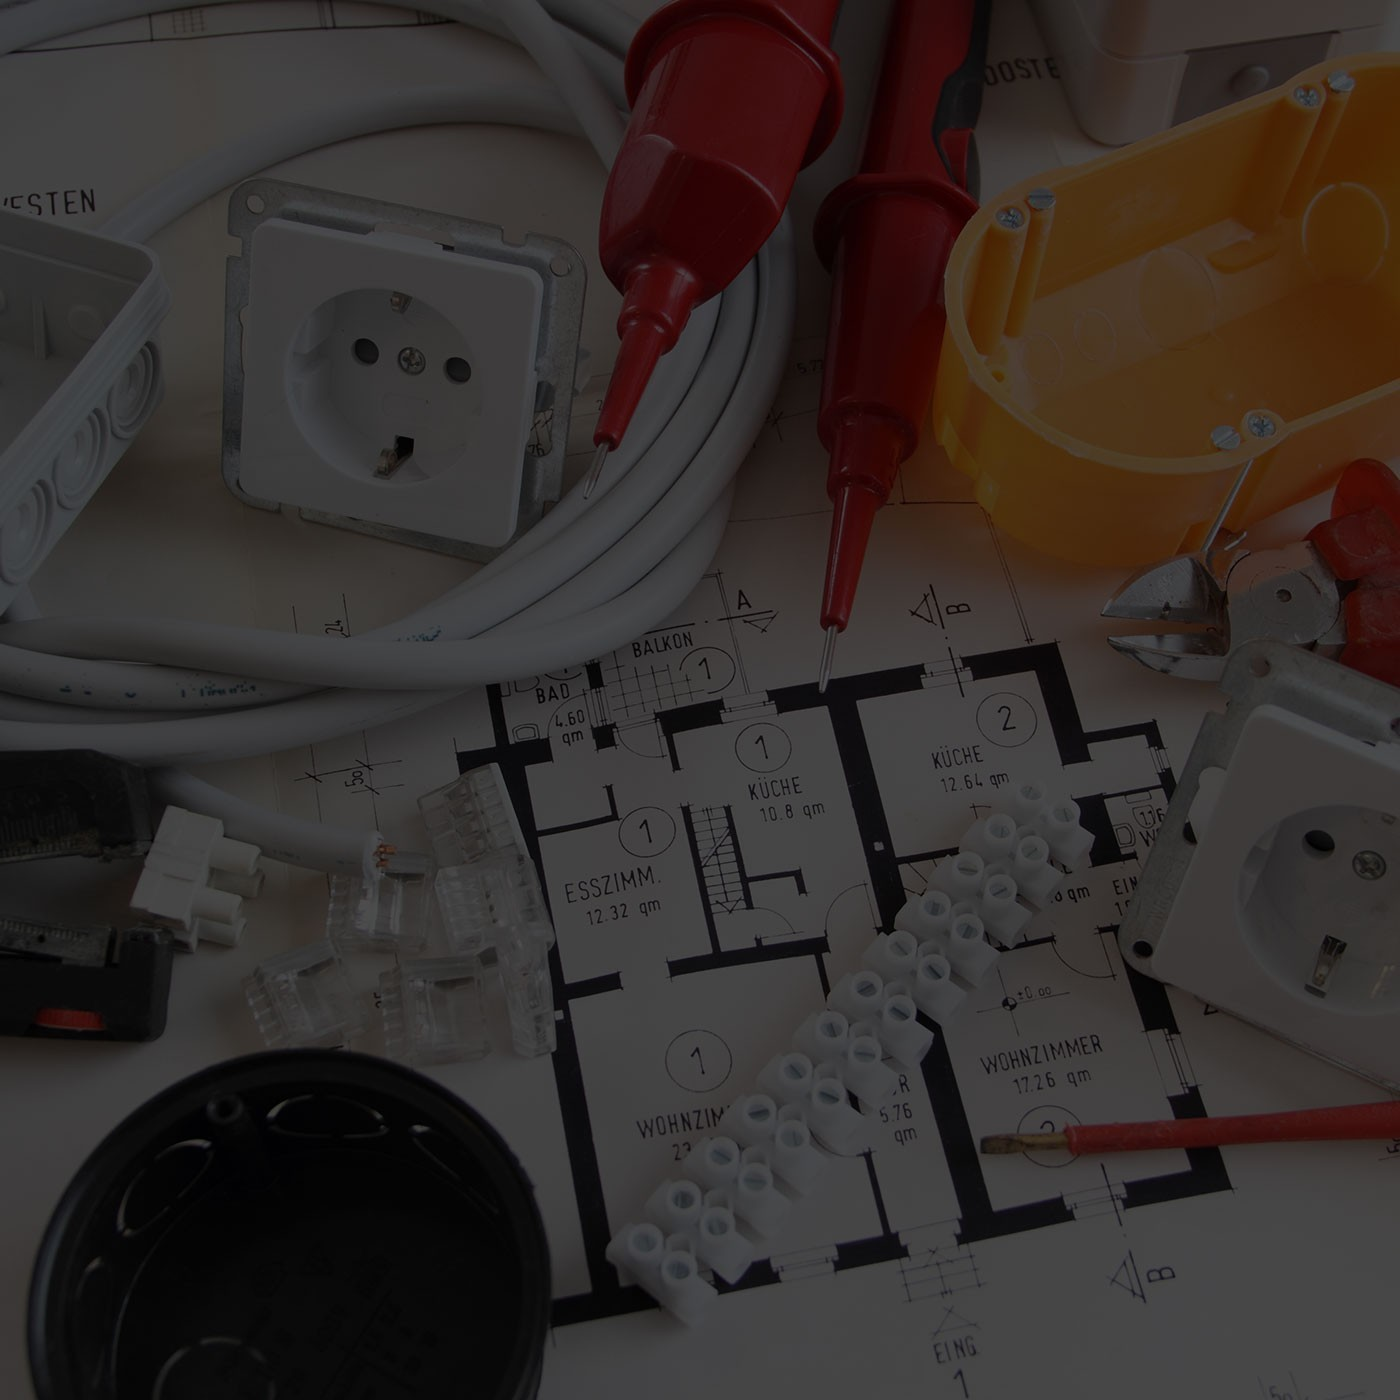 Mein Warenkorb - EMK Elektrotechnik Kuternig e.U.